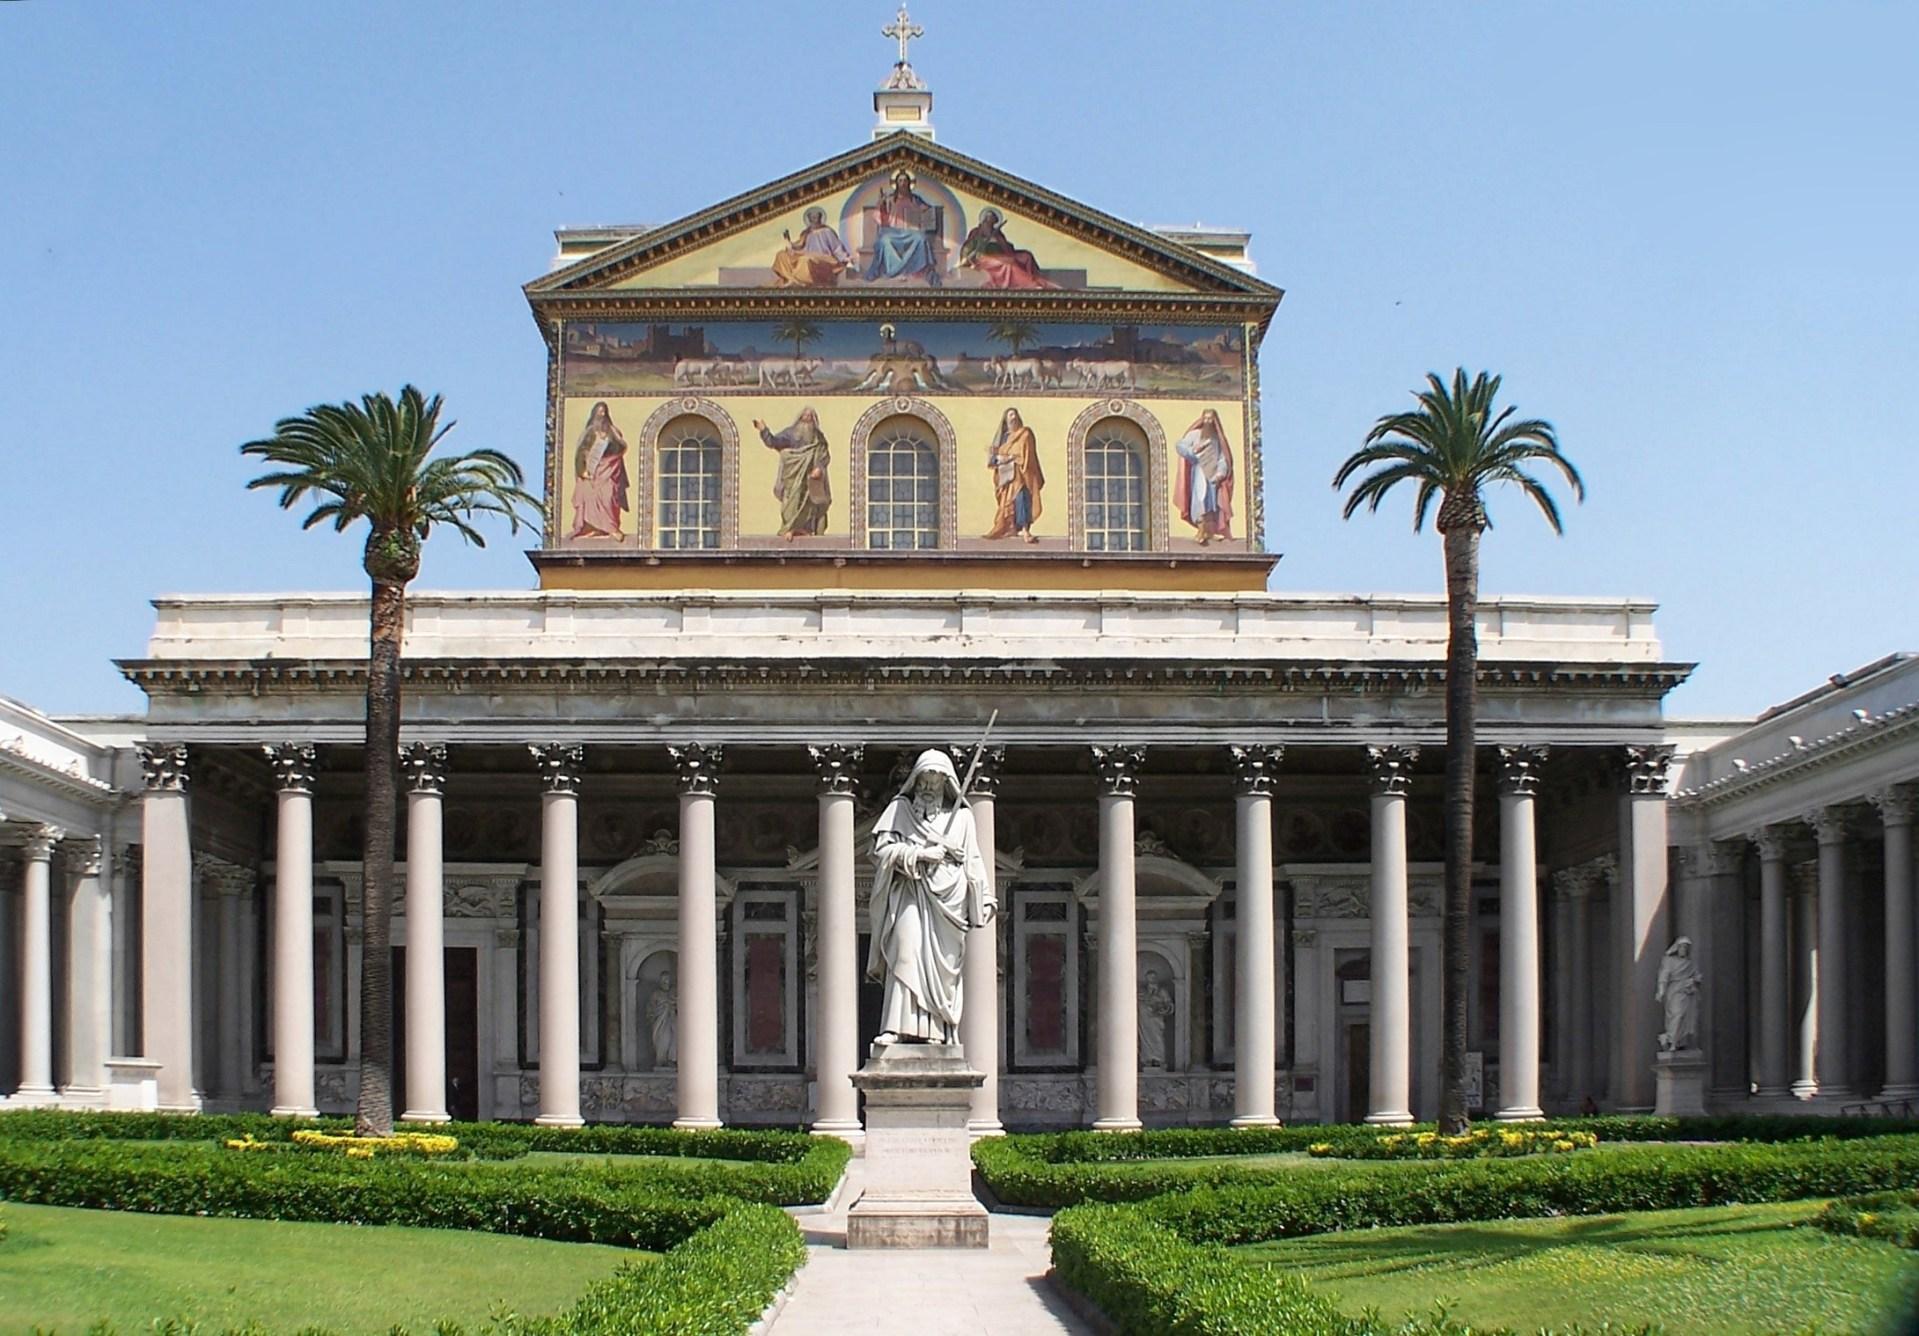 https://wp.en.aleteia.org/wp-content/uploads/sites/2/2021/01/web3-Saint-Paul-basilica-wiki.jpg?w=1920